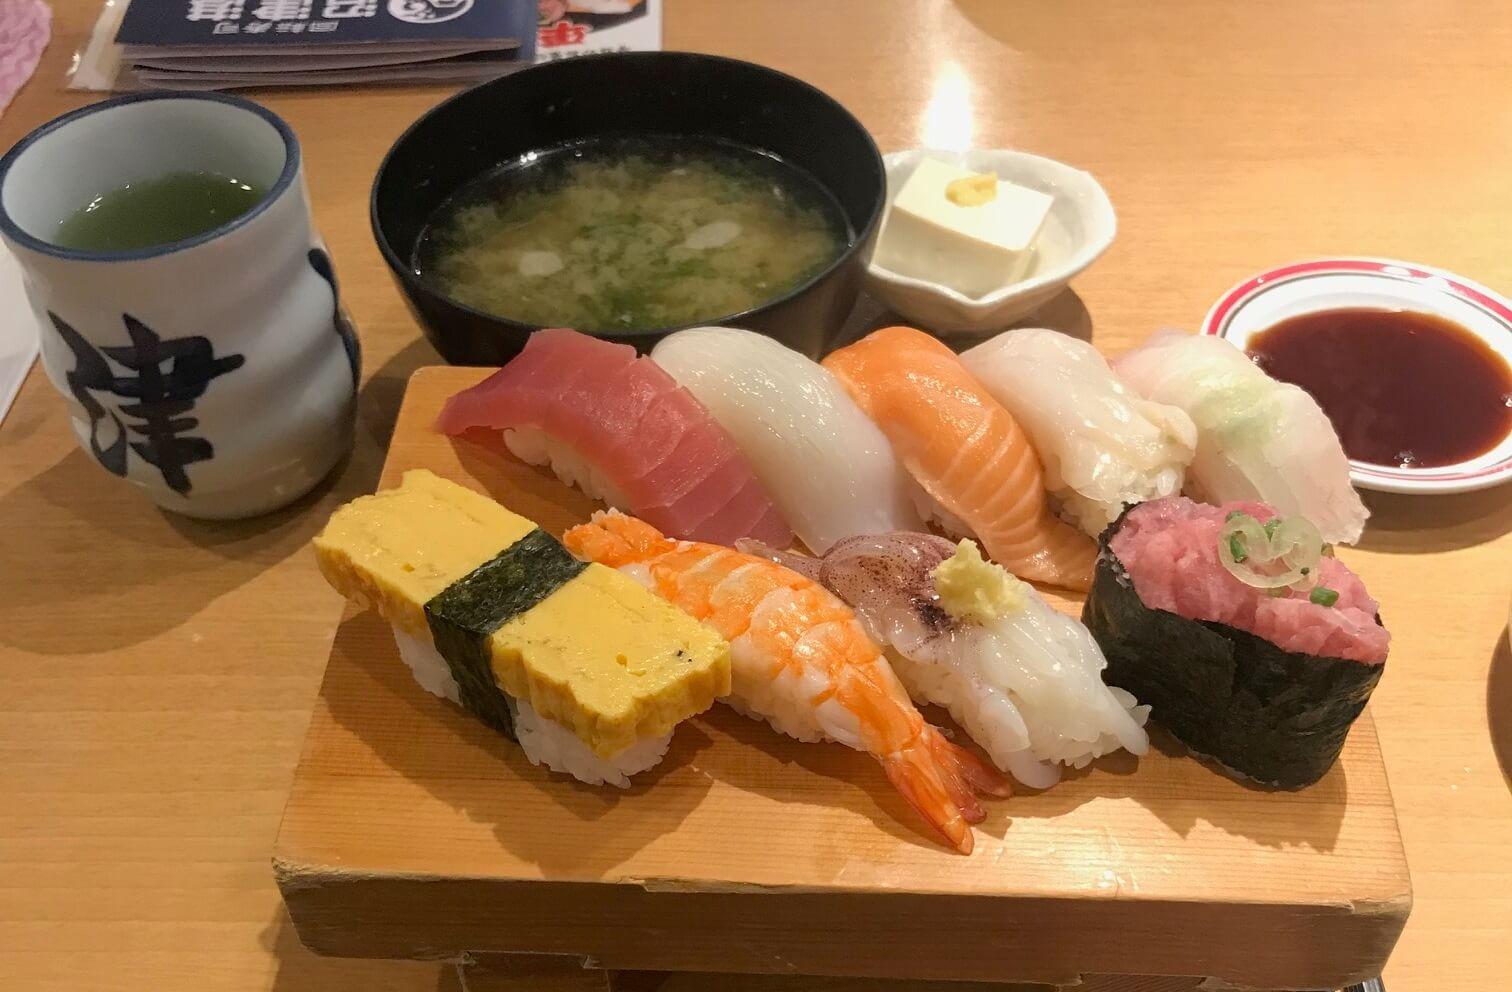 Sushi-Essen beim Praktikum in Japan